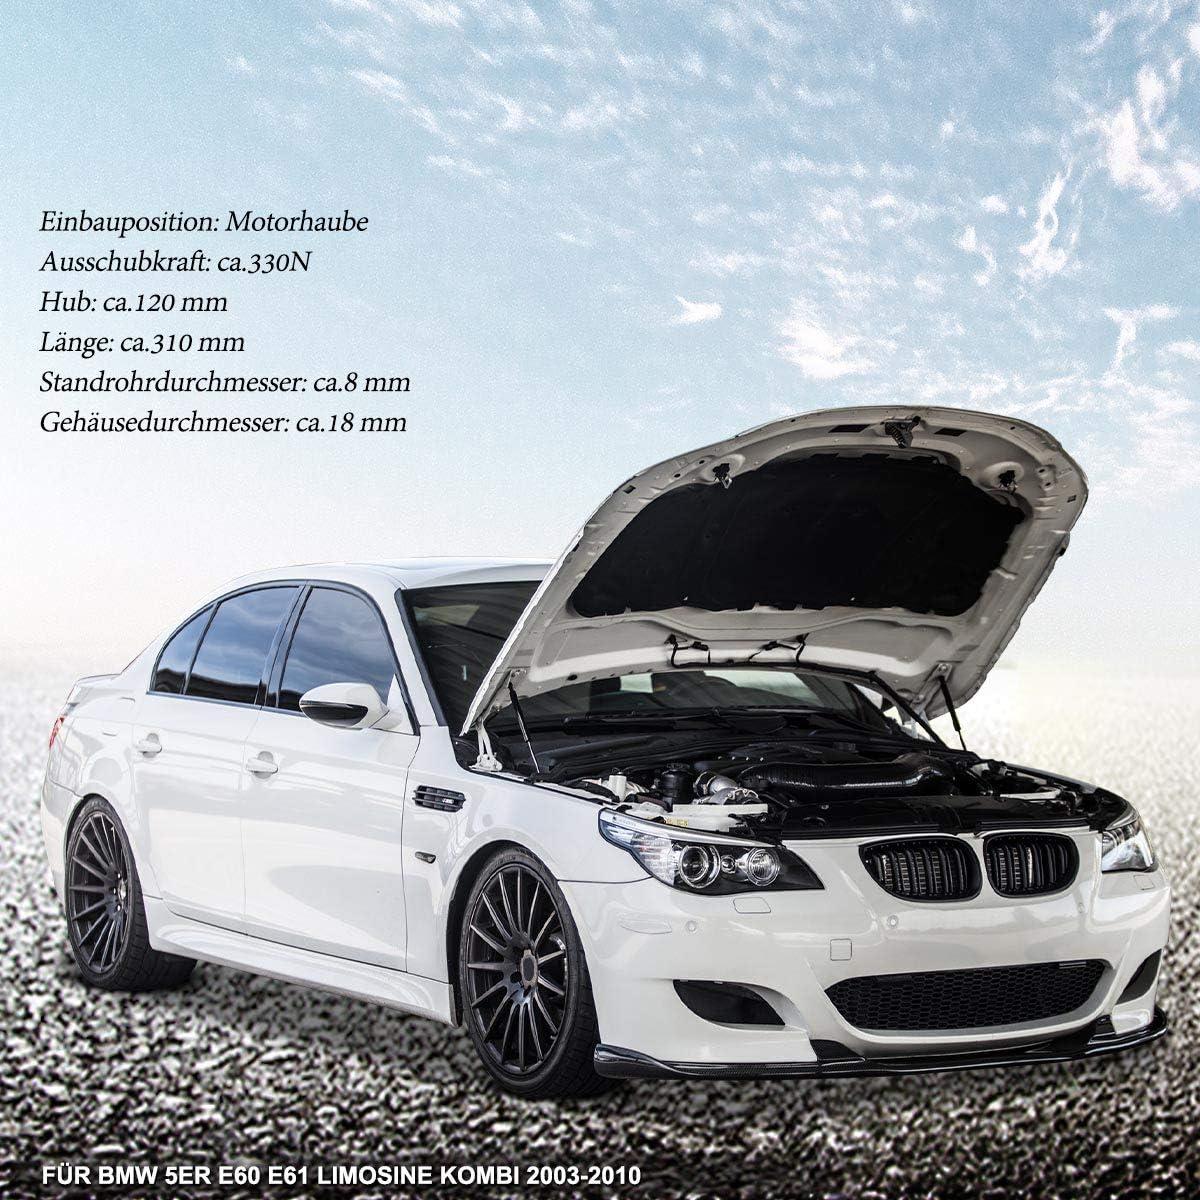 2 X Gas Spring Damper Bonnet For 5 Series E60 E61 520 523 525 530 535 540 550 2003 2011 51237008745 Auto